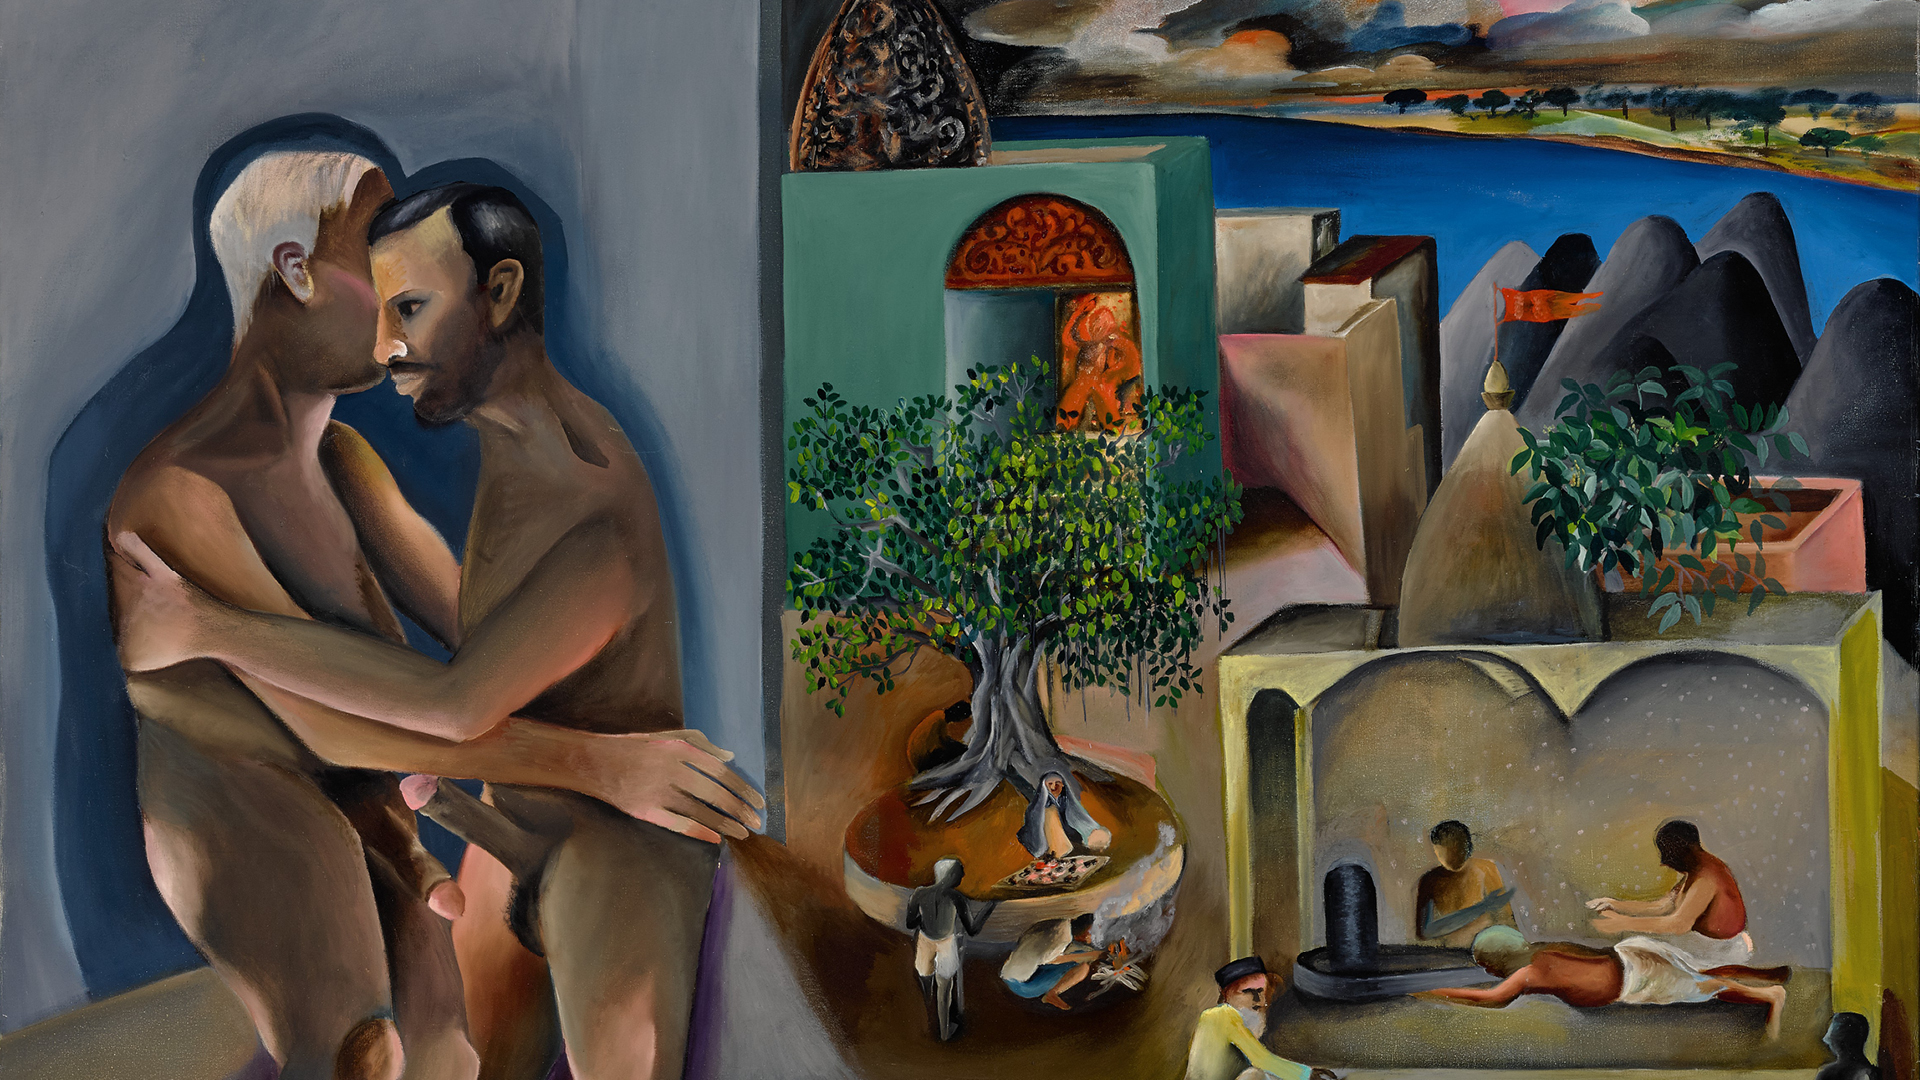 Bhupen Khakhar, Two Men in Benares, oil on canvas, 1982, est. £450,000-600,000| Sotheby's| STIR